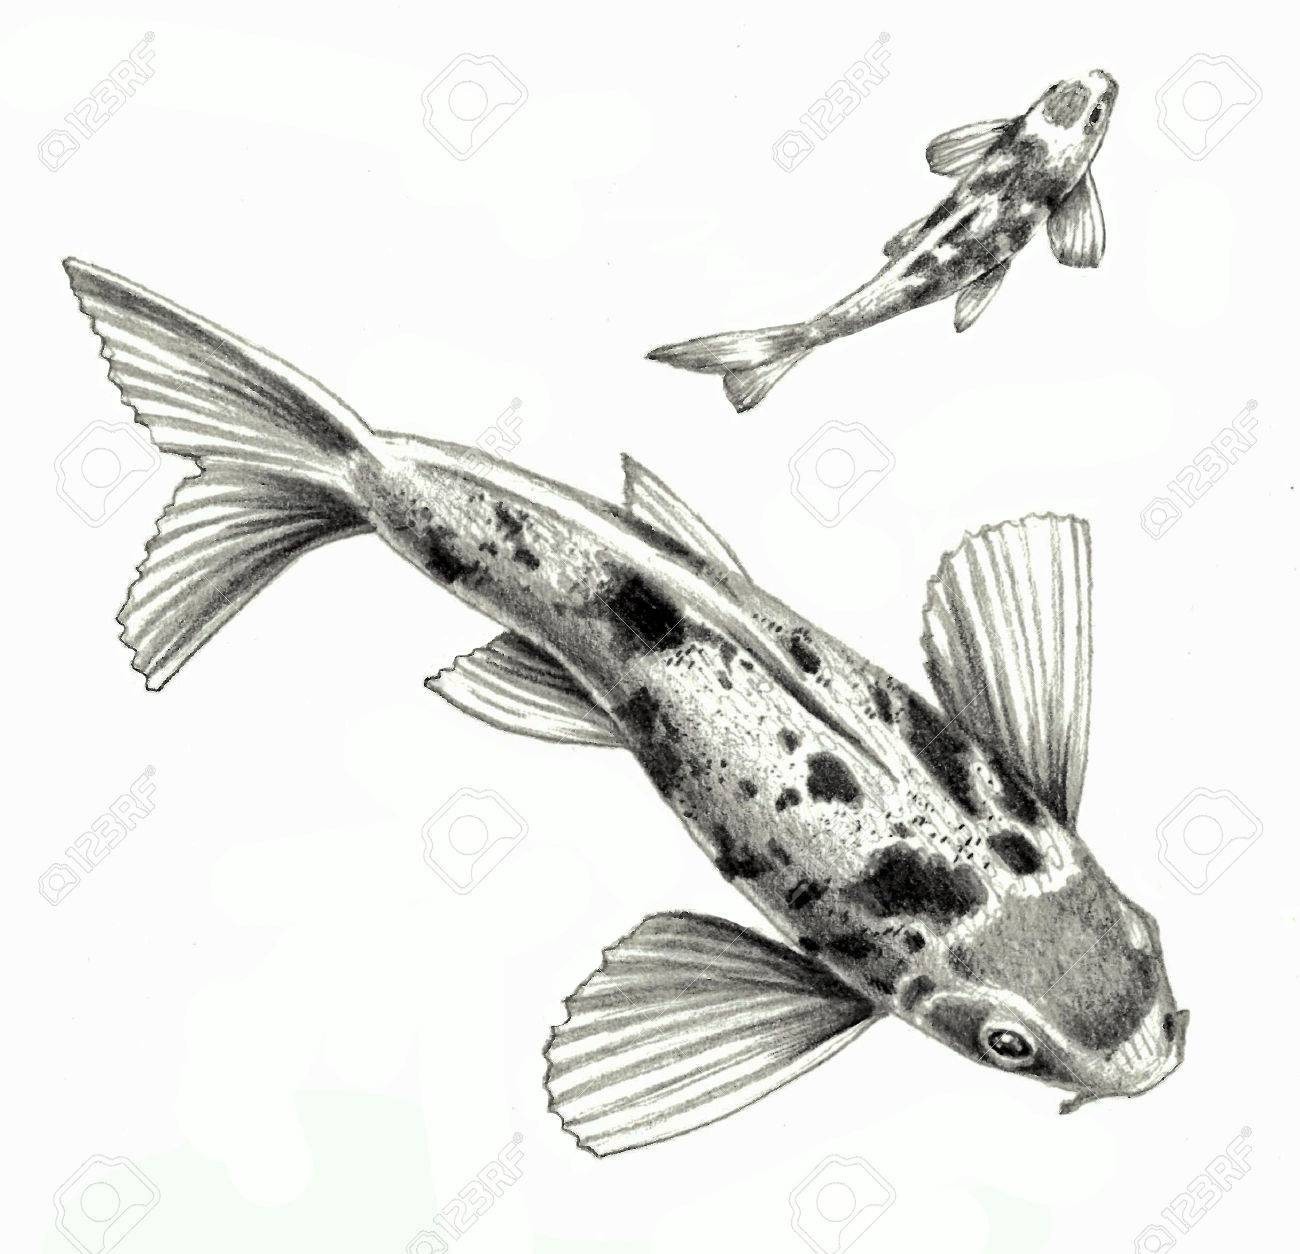 koi fish drawing images u0026 stock pictures royalty free koi fish